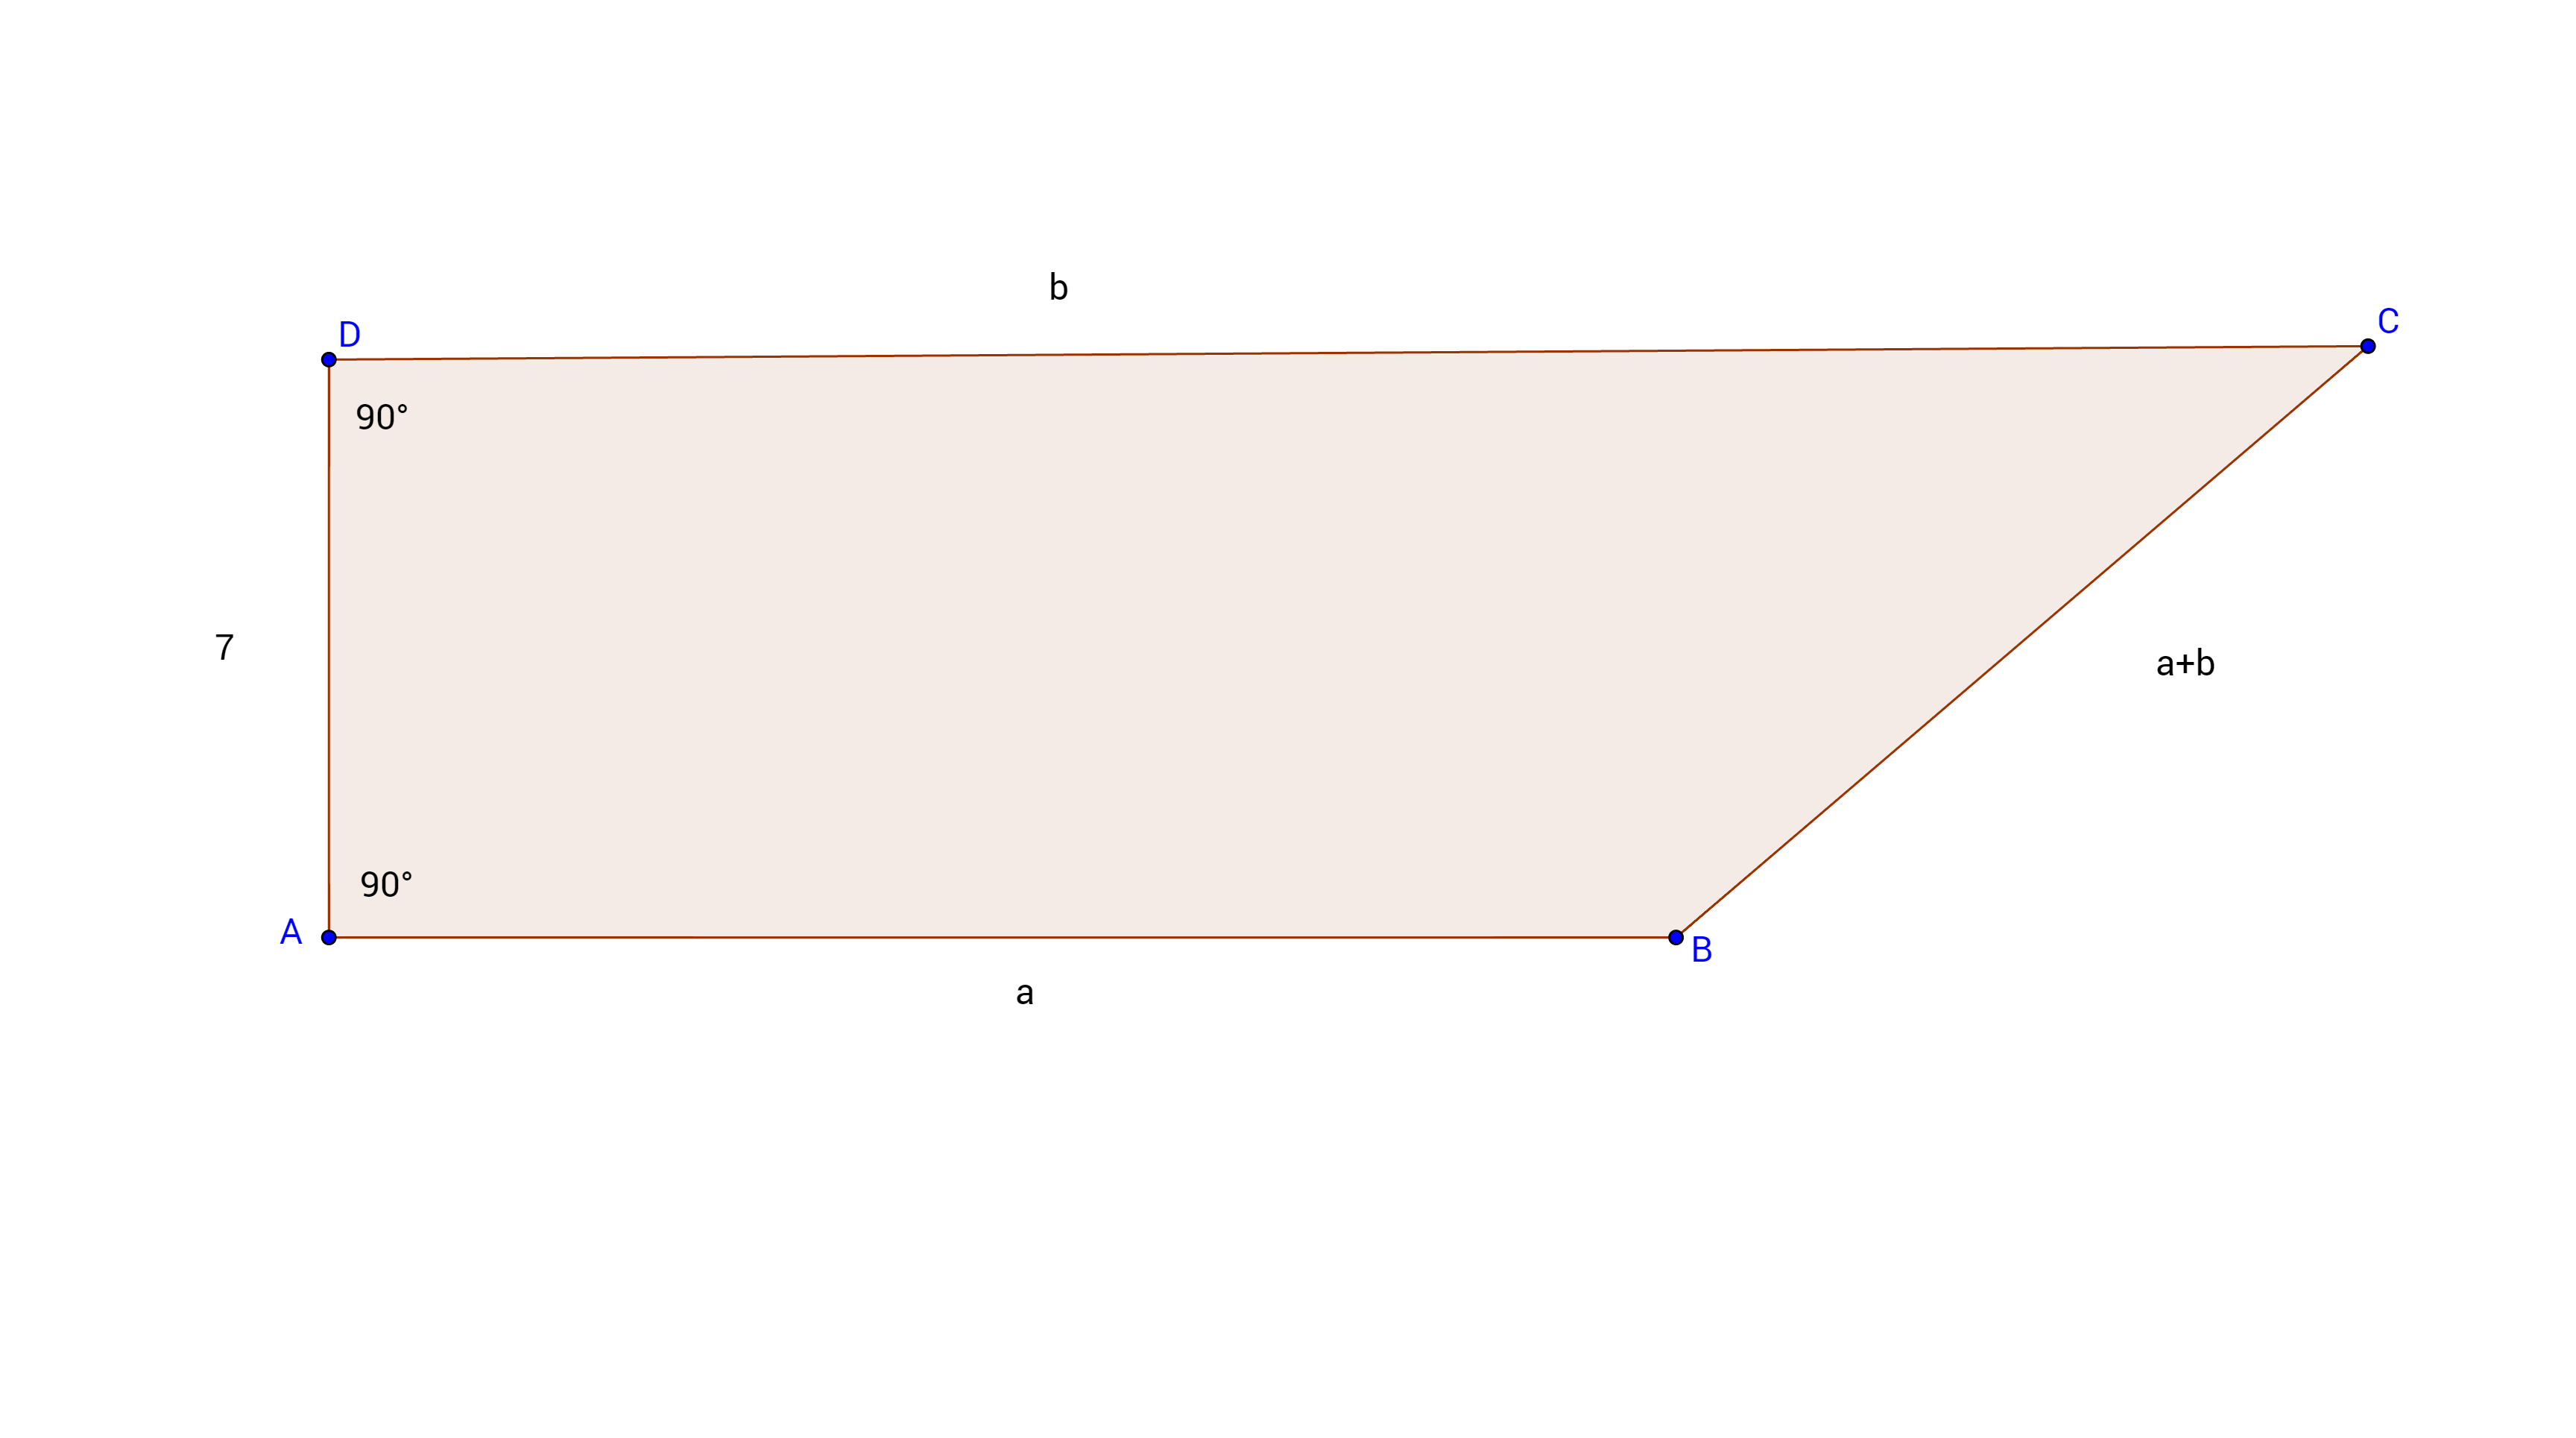 web.geogebra.org